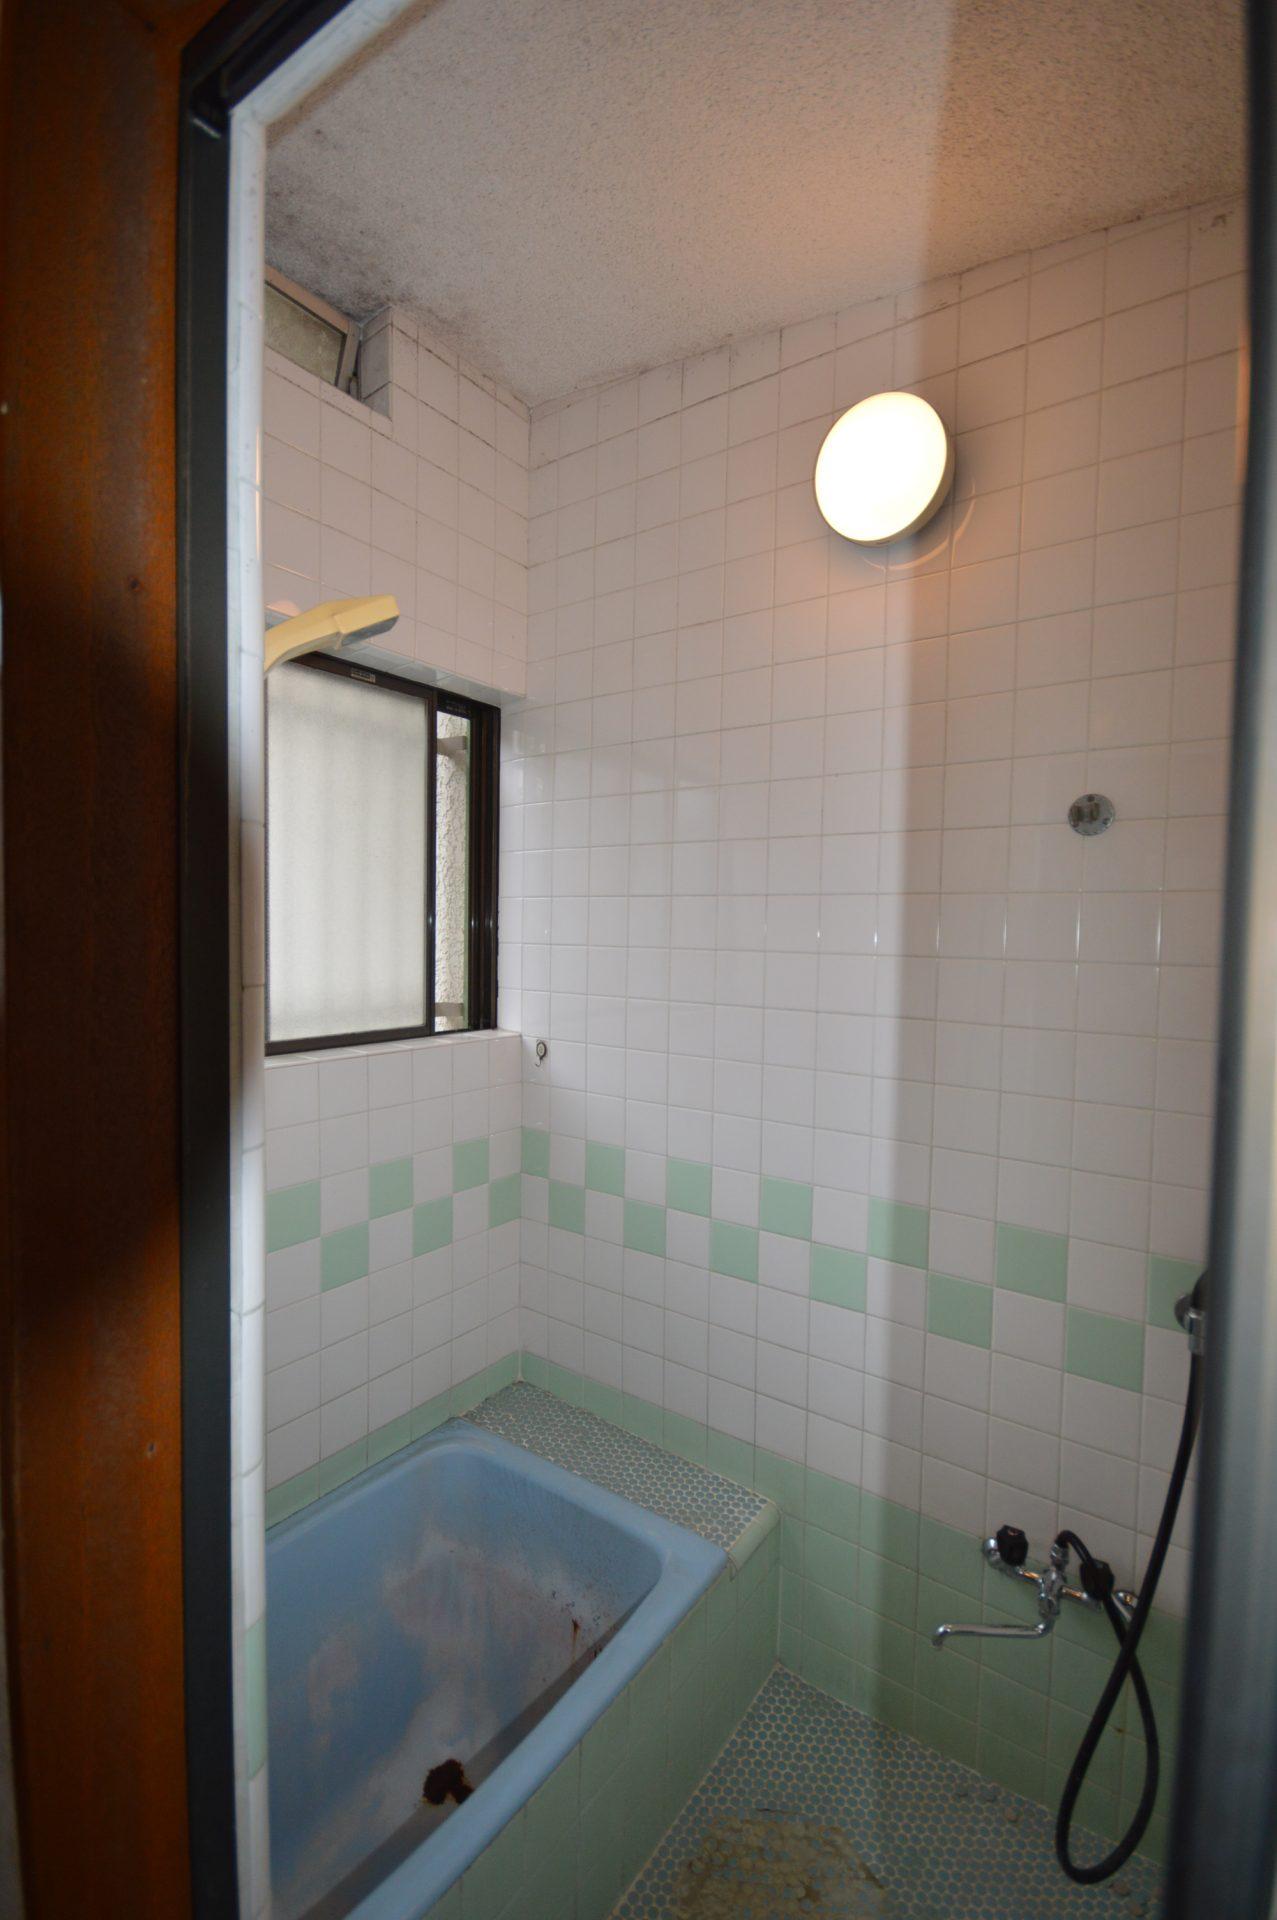 Before:昔ながらのタイル貼り浴室